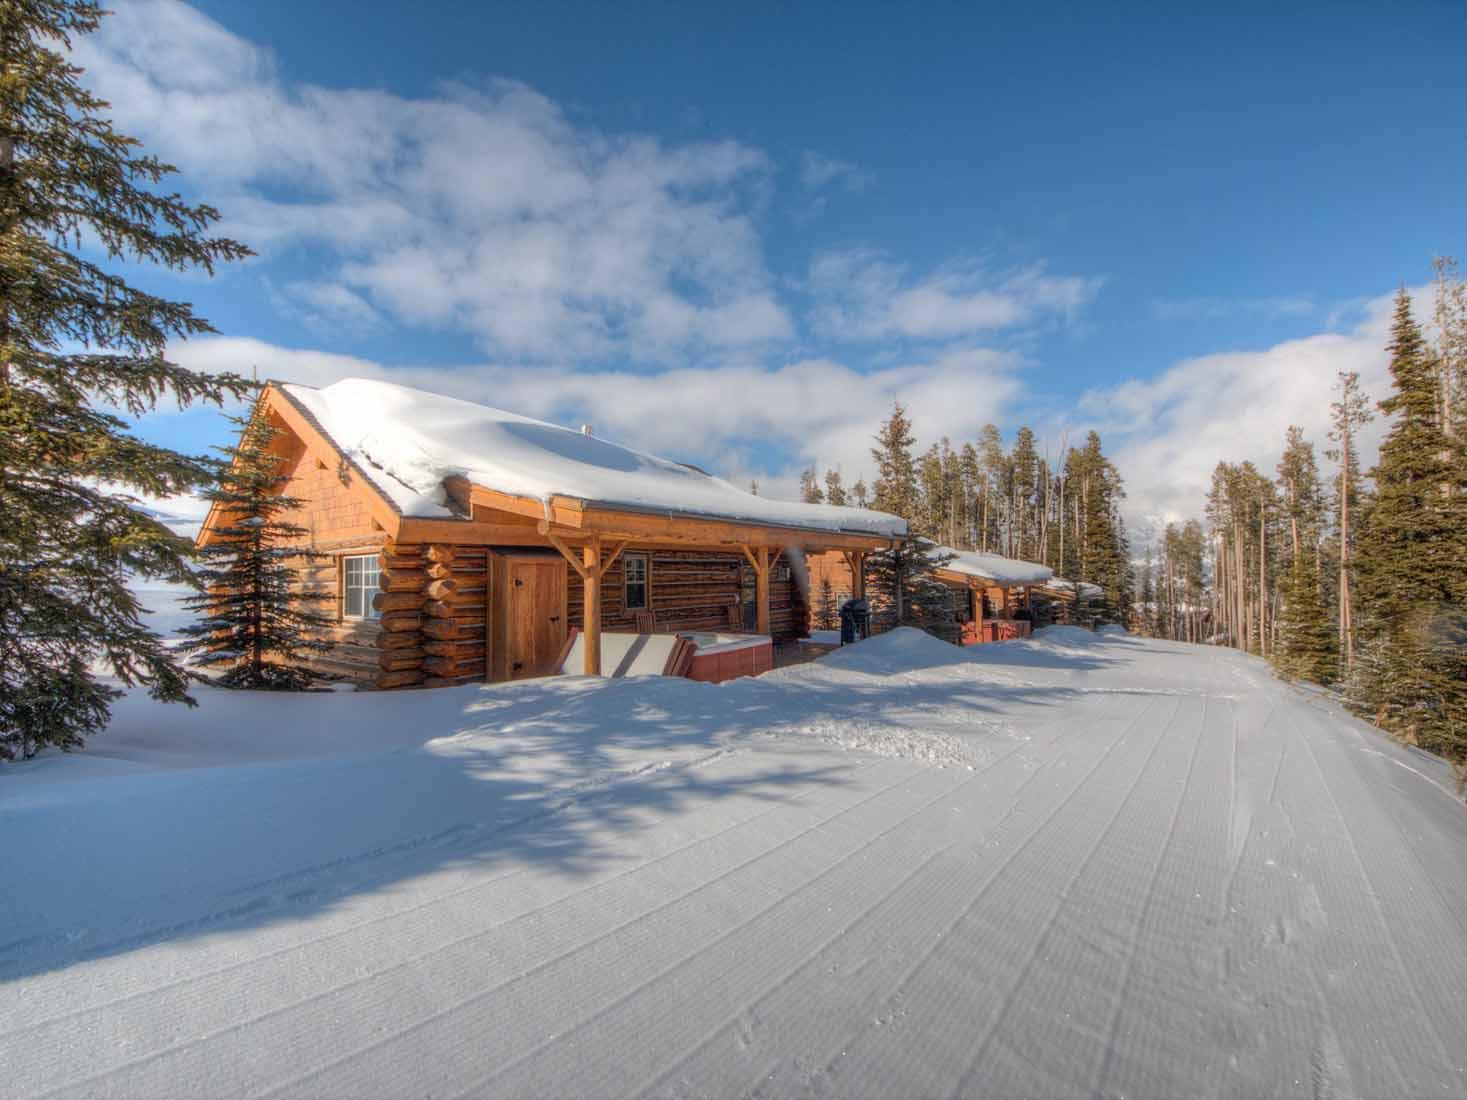 Cowboy Heaven Cabin 7 Rustic Ridge profile image